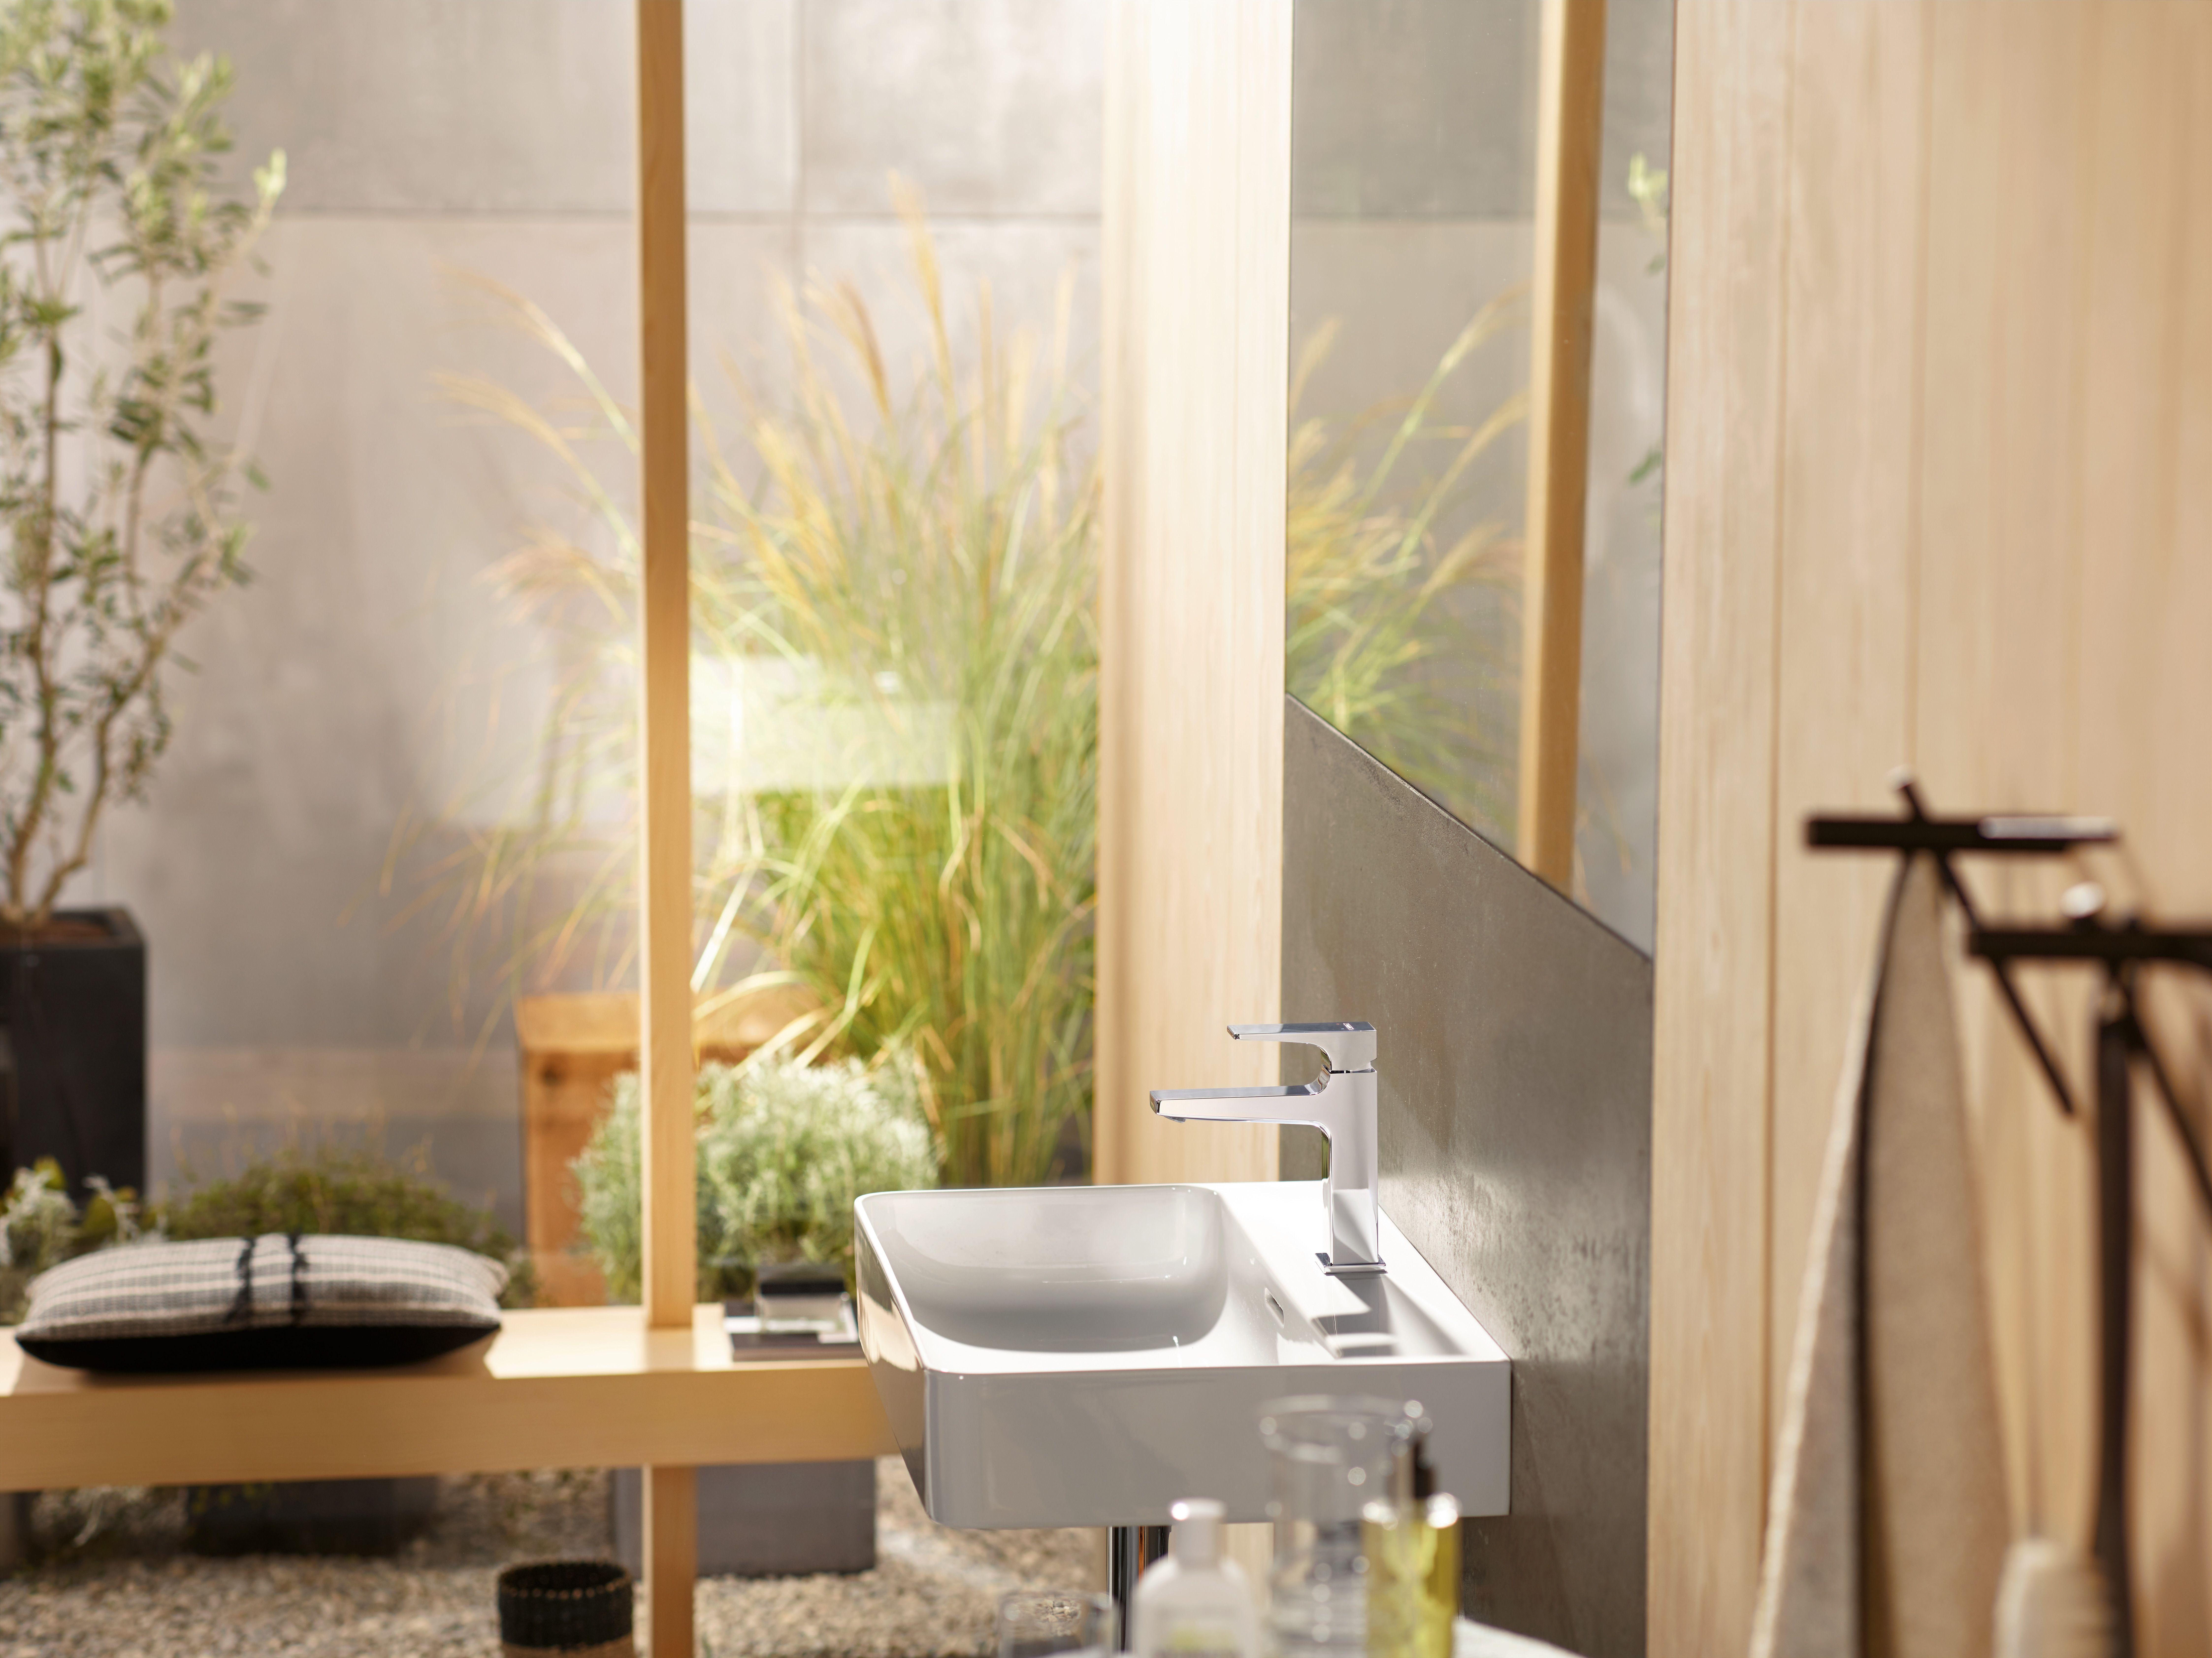 hansgrohe metropol bathroom faucet with lever handle modern bathroom hansgrohe retro home decor